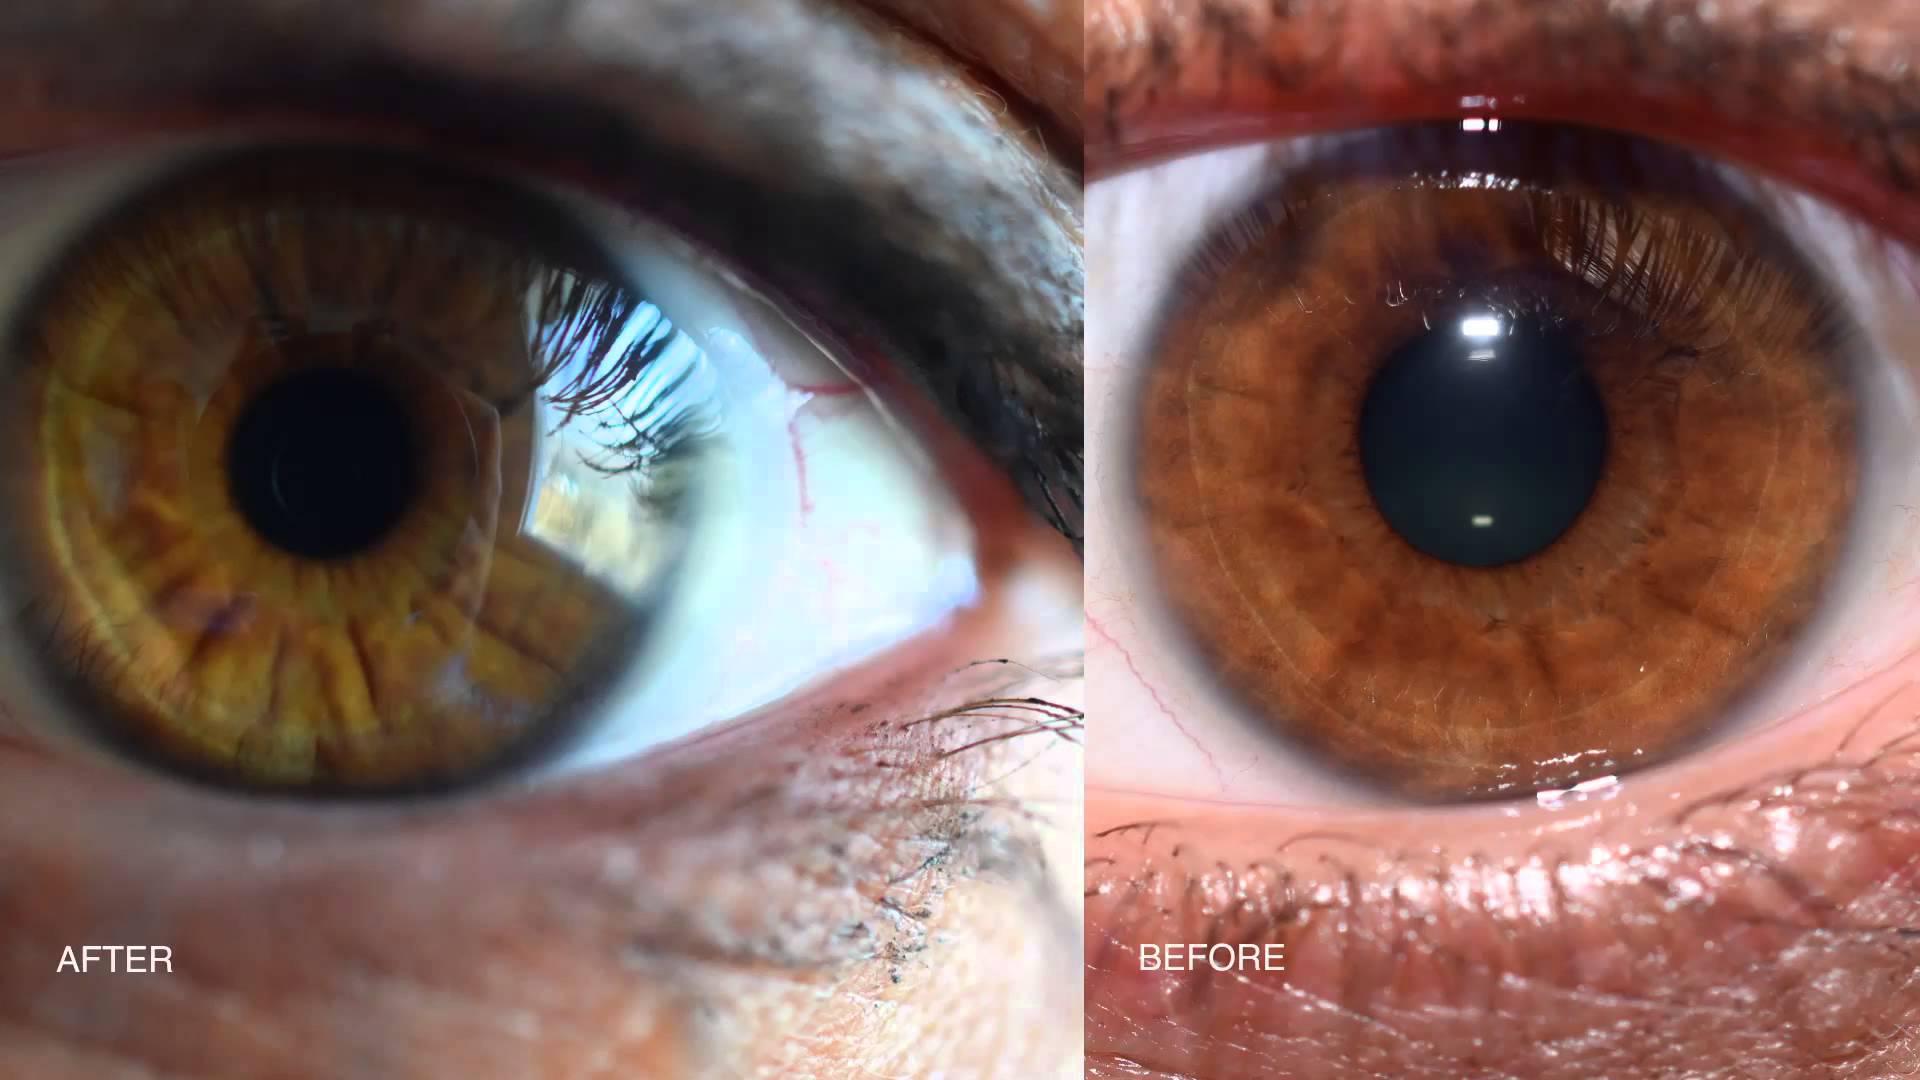 22 photos iridology before and after iriscope iridology camera iridology before and after photos 2 maxresdefault nvjuhfo Choice Image